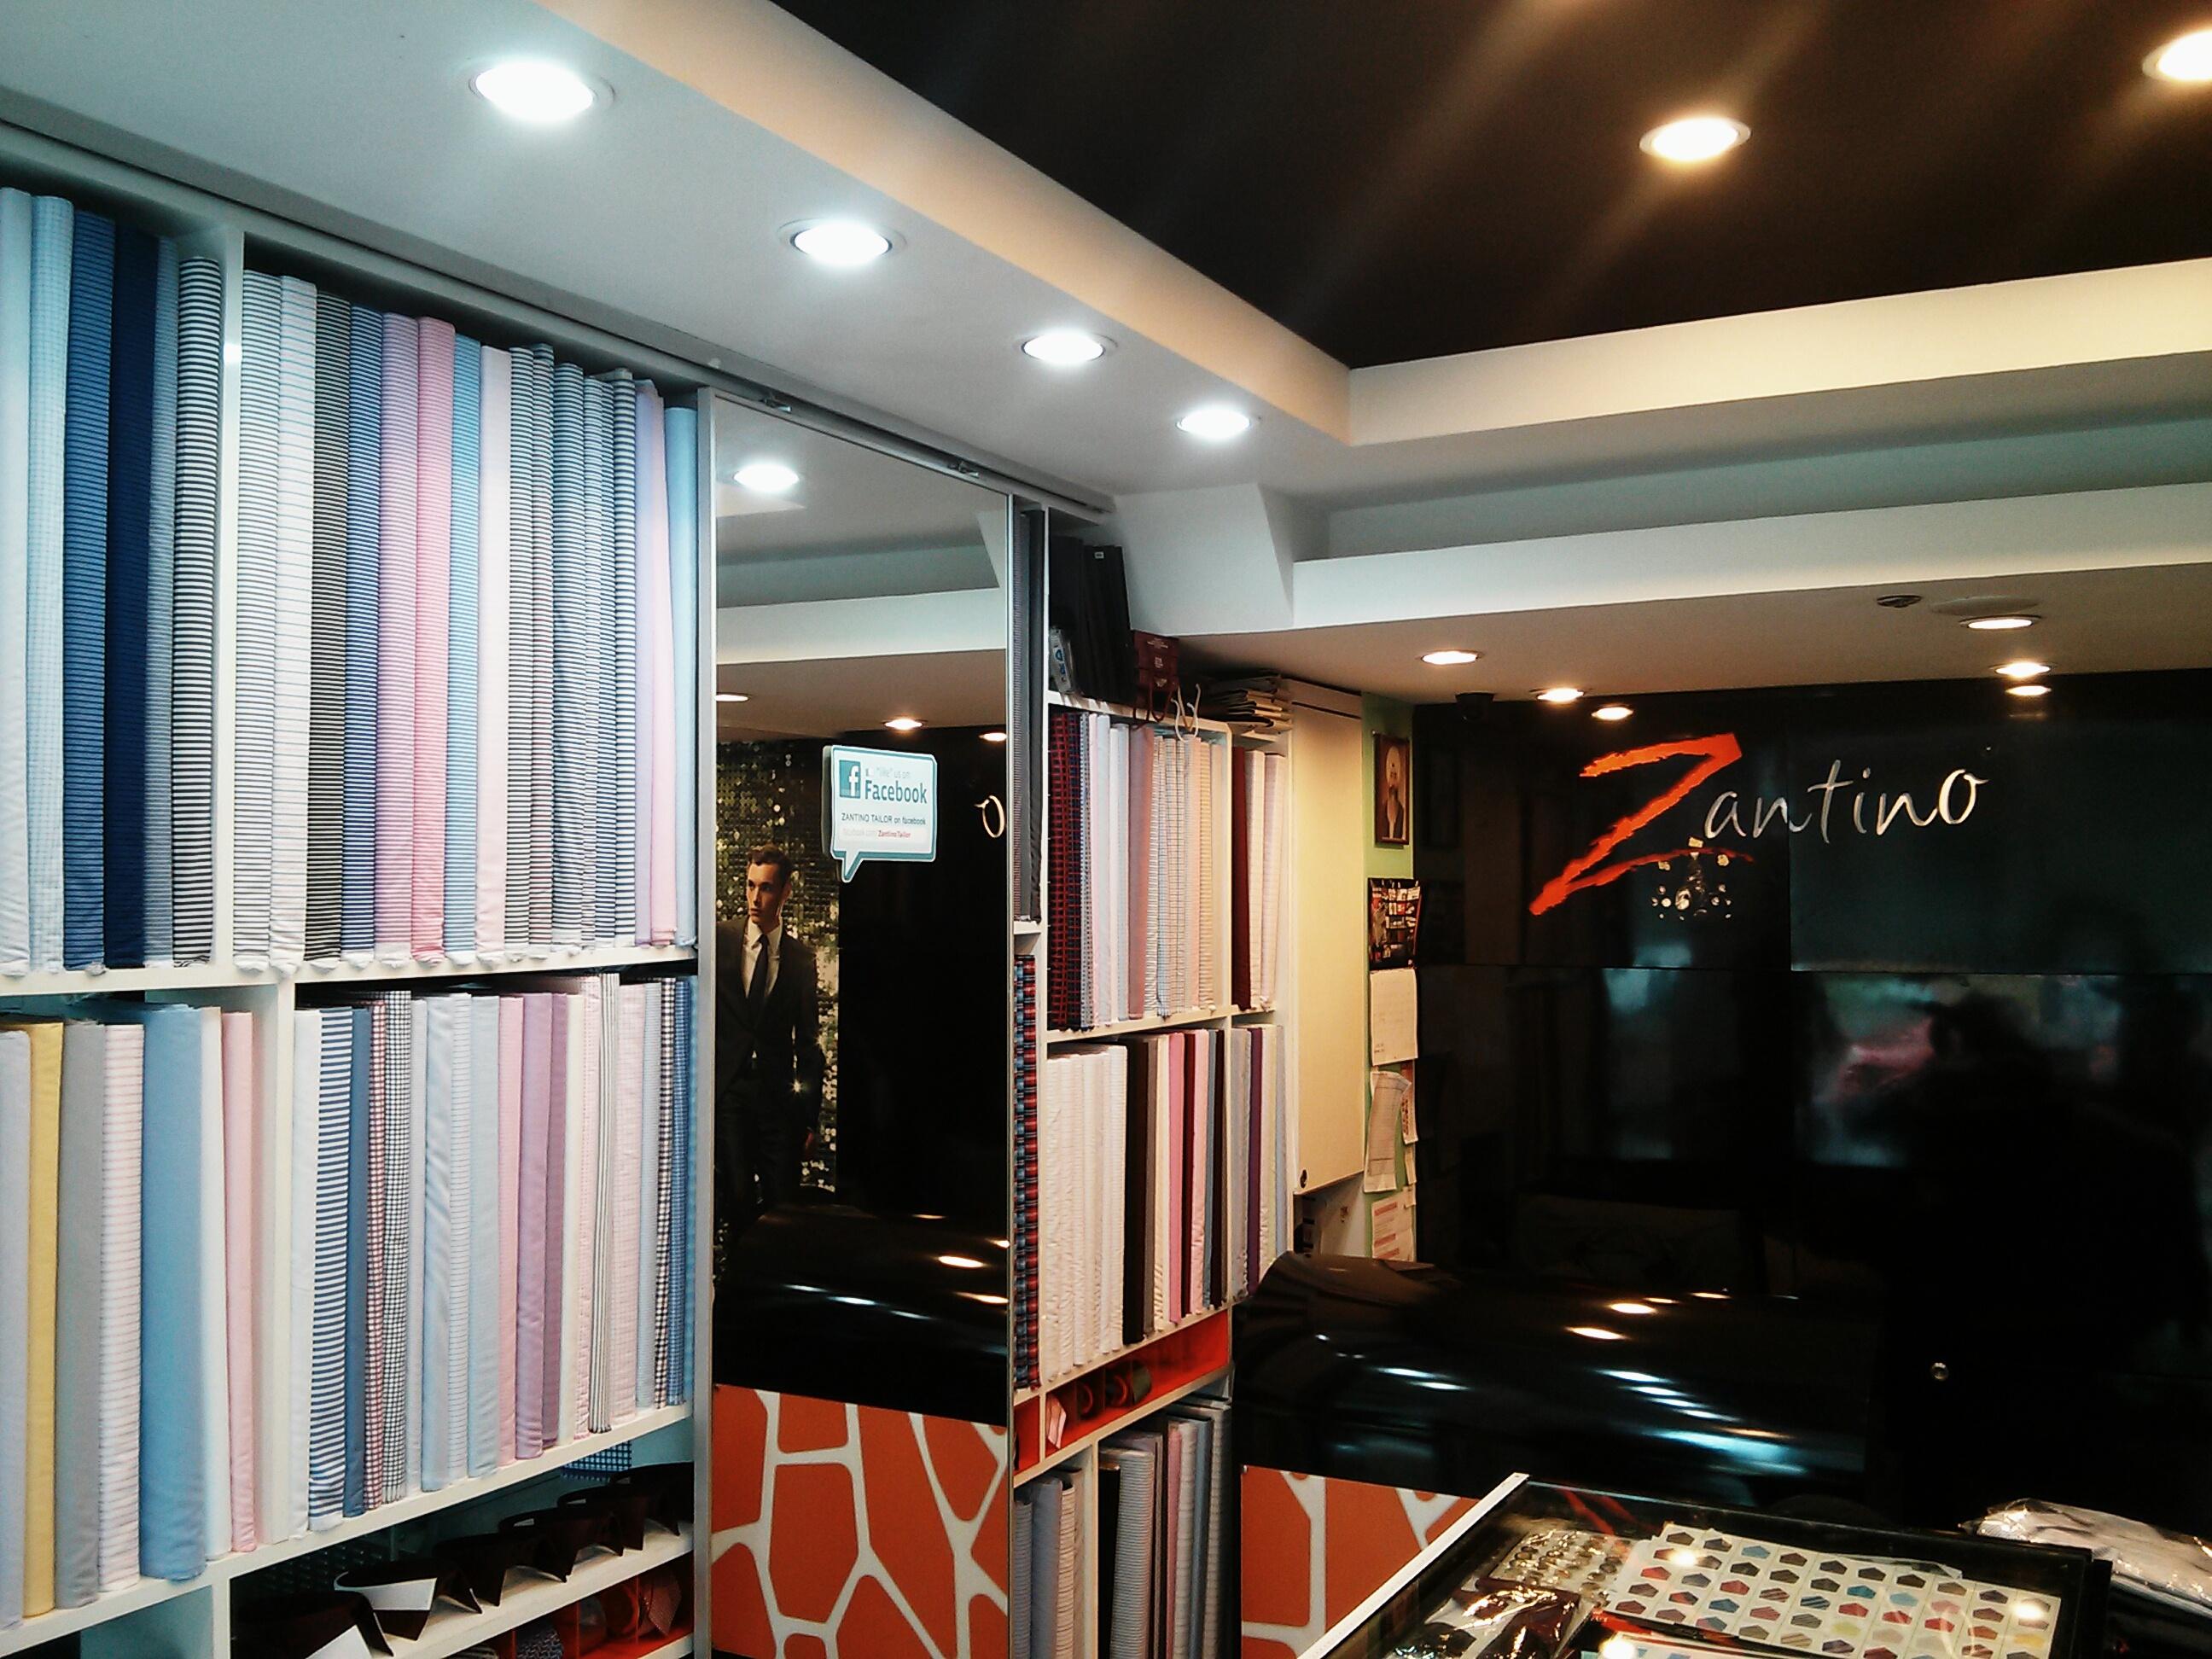 Picture of hotel indigo bangkok wireless road bangkok tripadvisor - Zantino Tailor